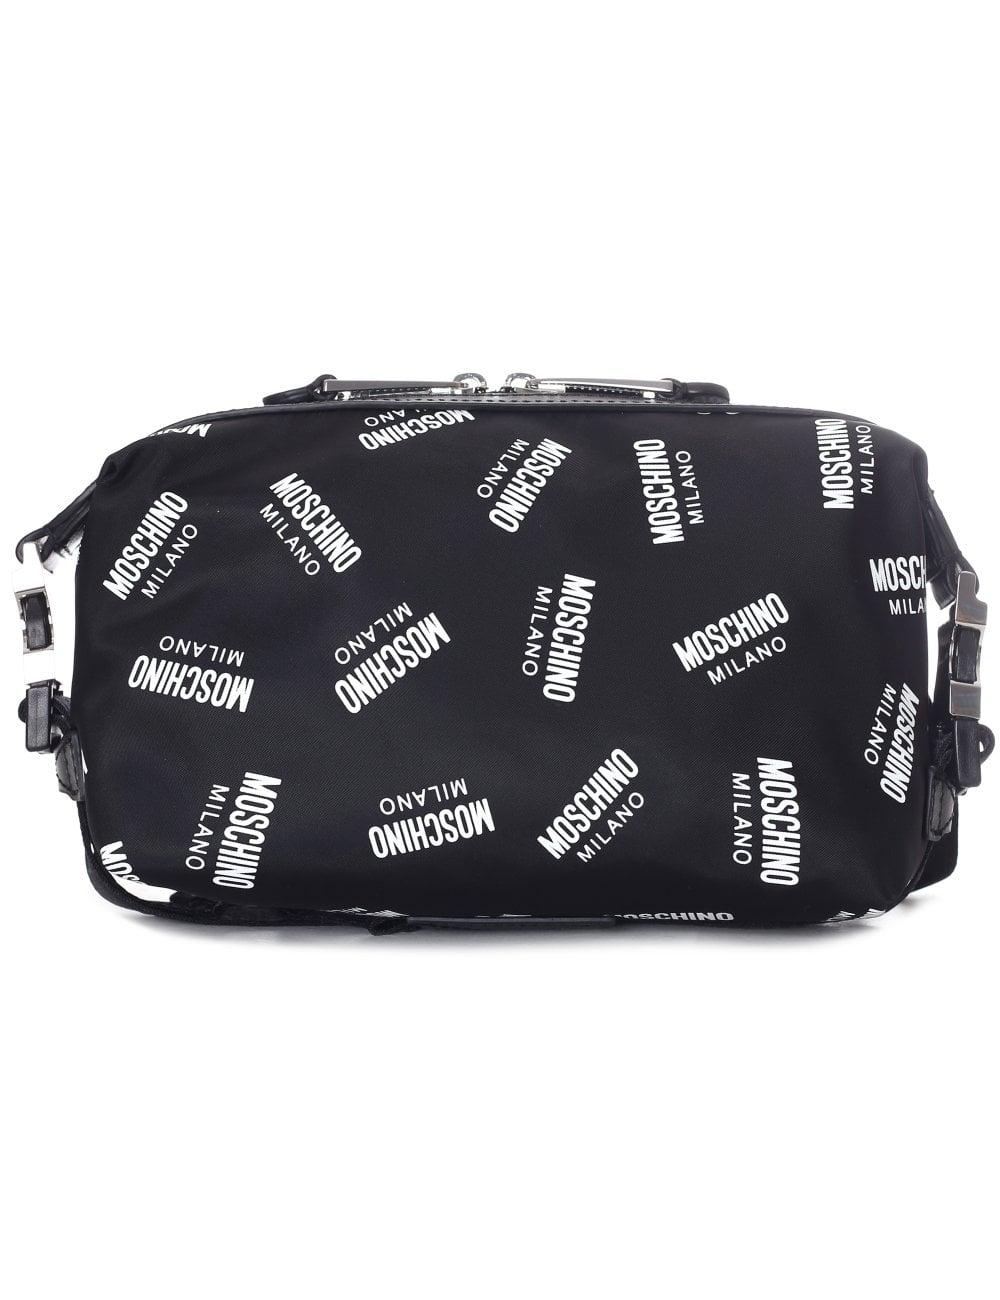 Moschino Couture Women S All Over Logo Bum Bag